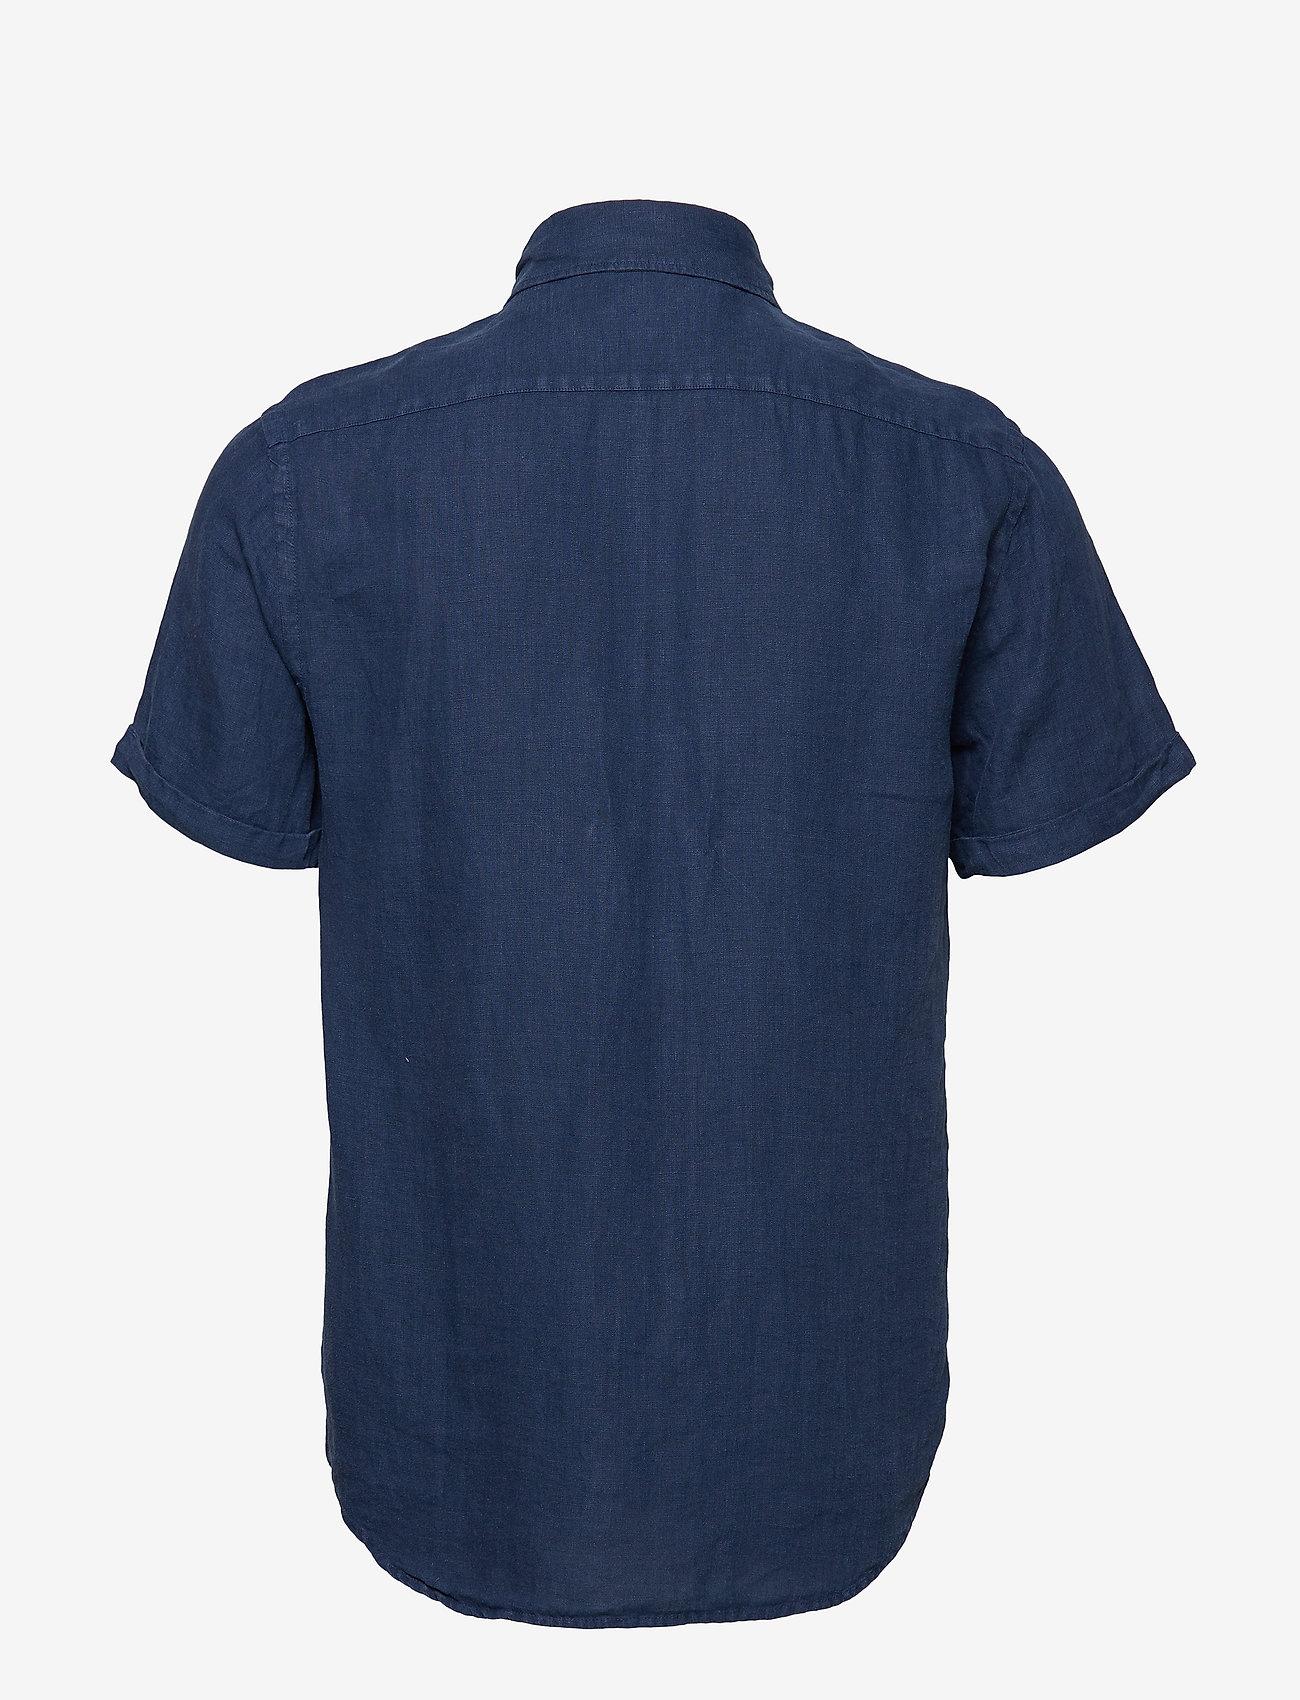 Scotch & Soda - REGULAR FIT- Garment-dyed linen shortsleeve shirt - basic skjorter - denim blue - 1